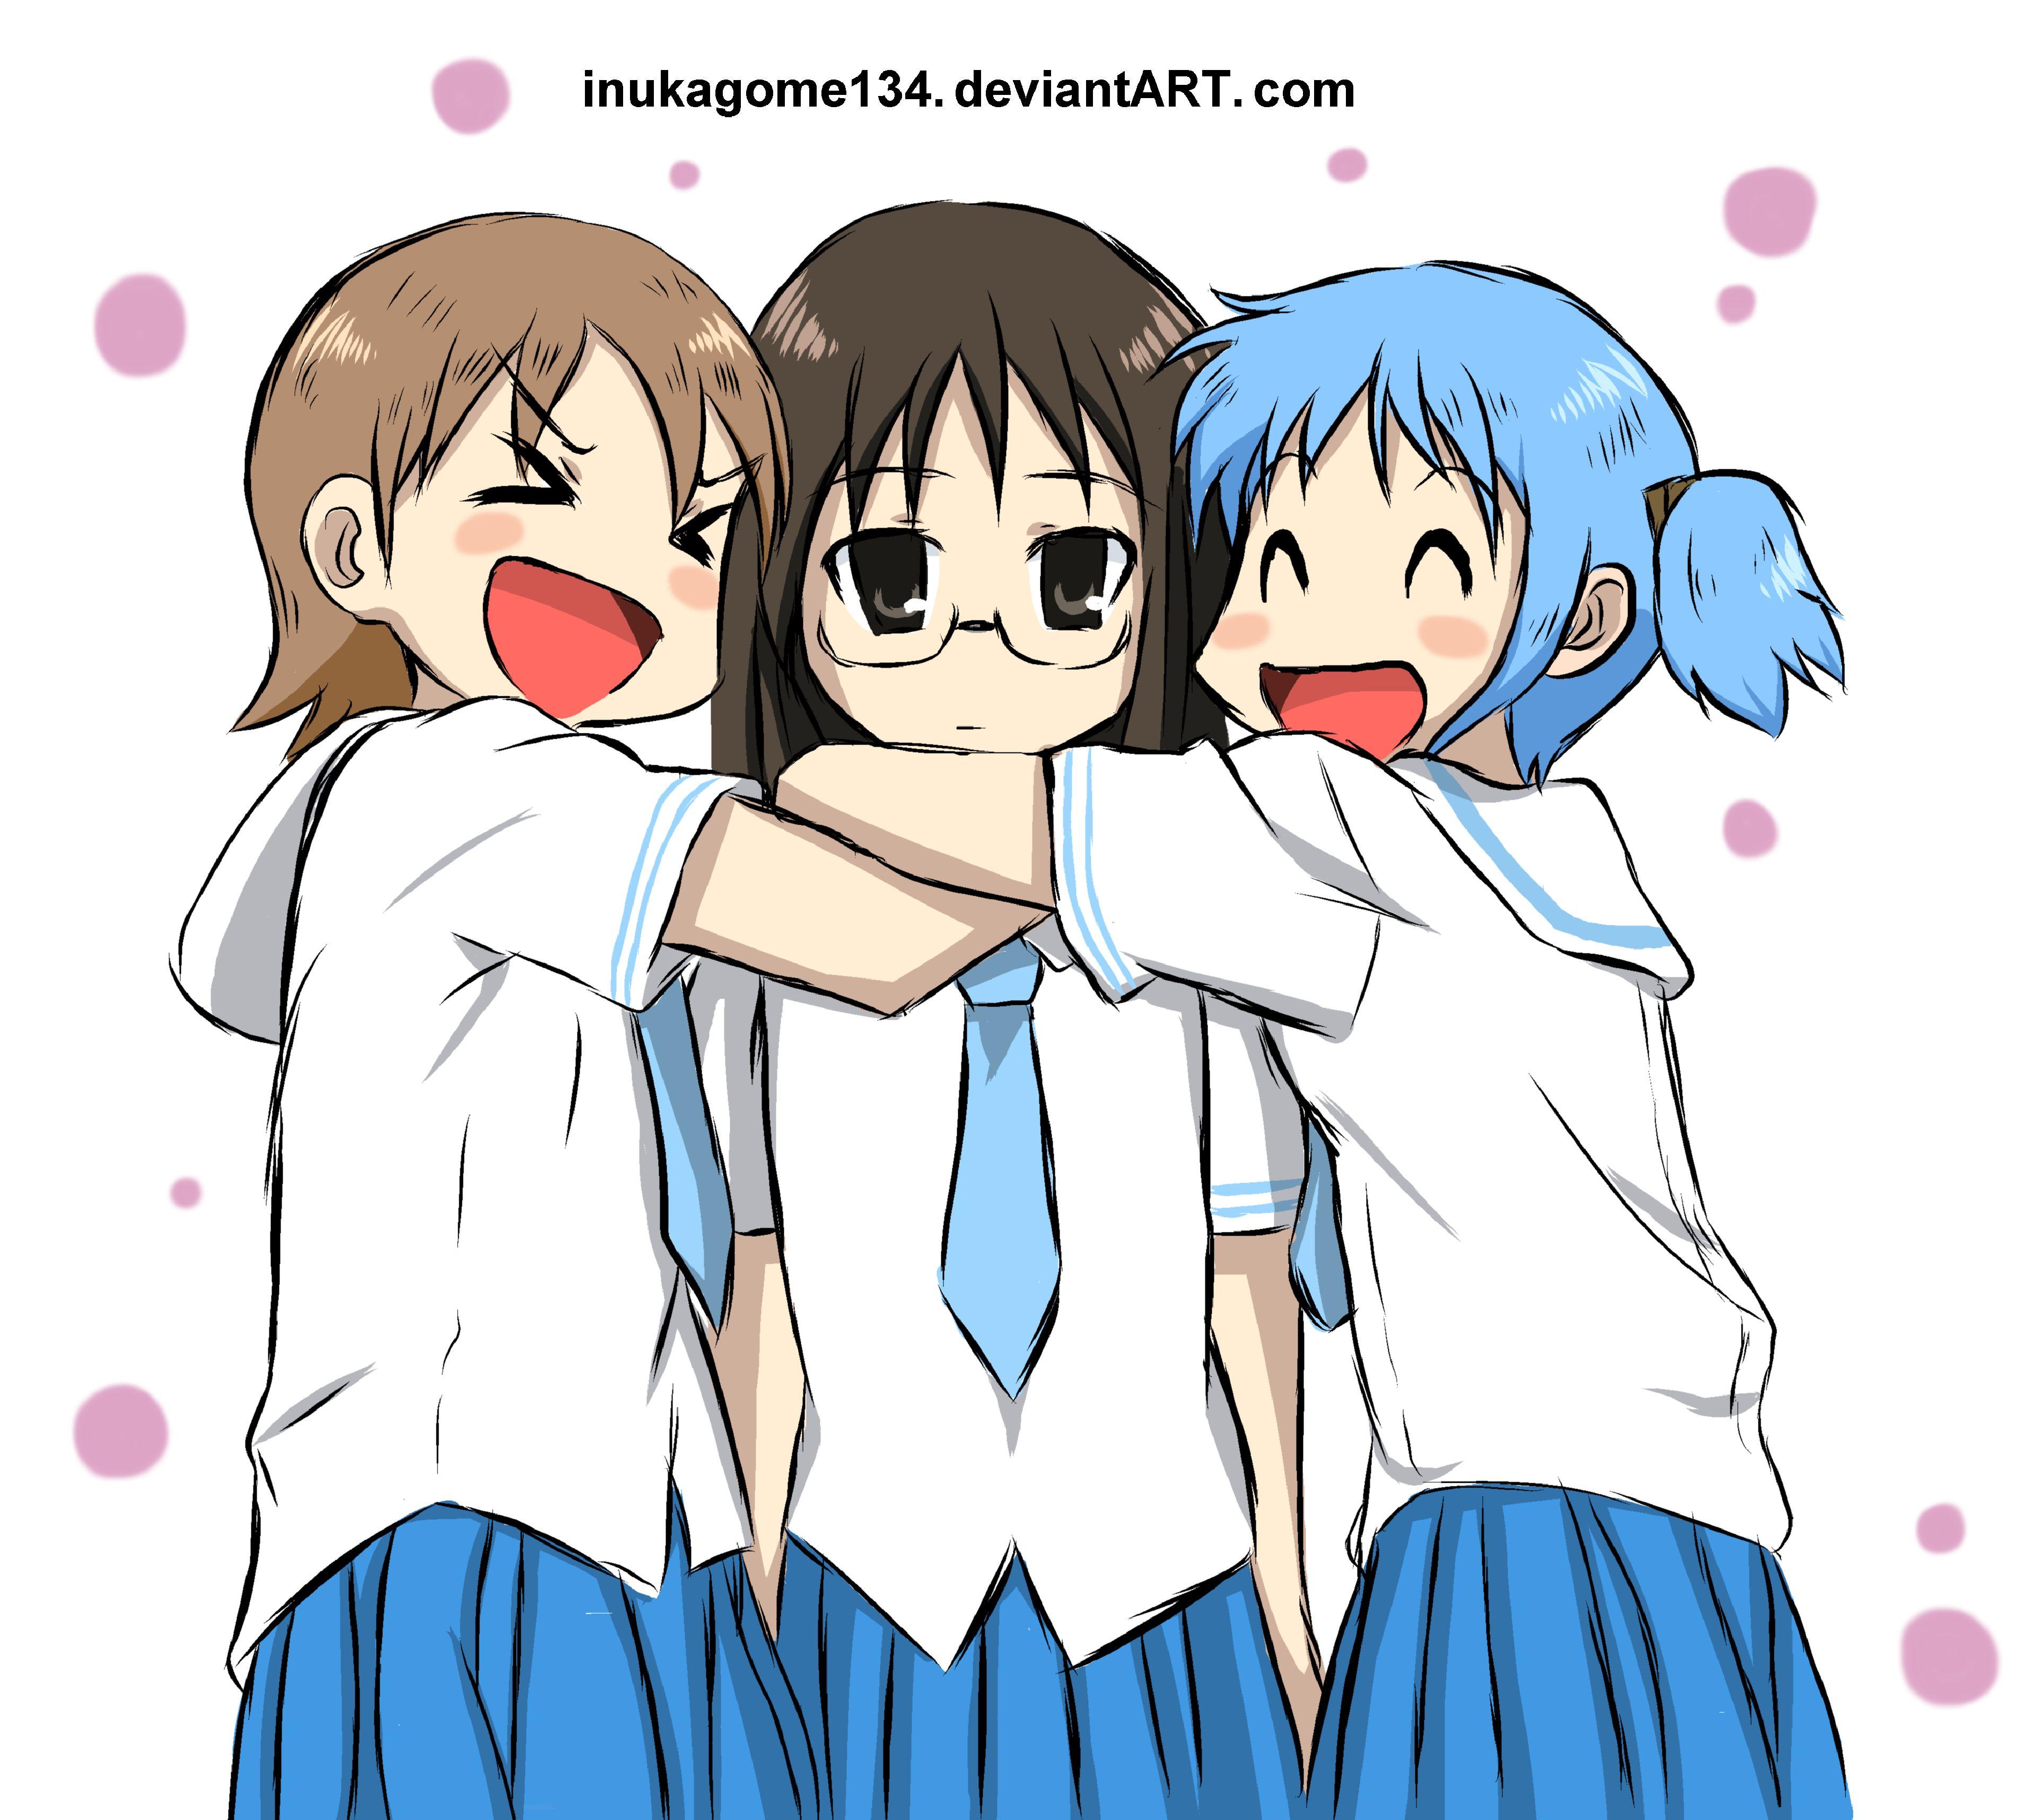 BFF'S, girlfriends, friendship